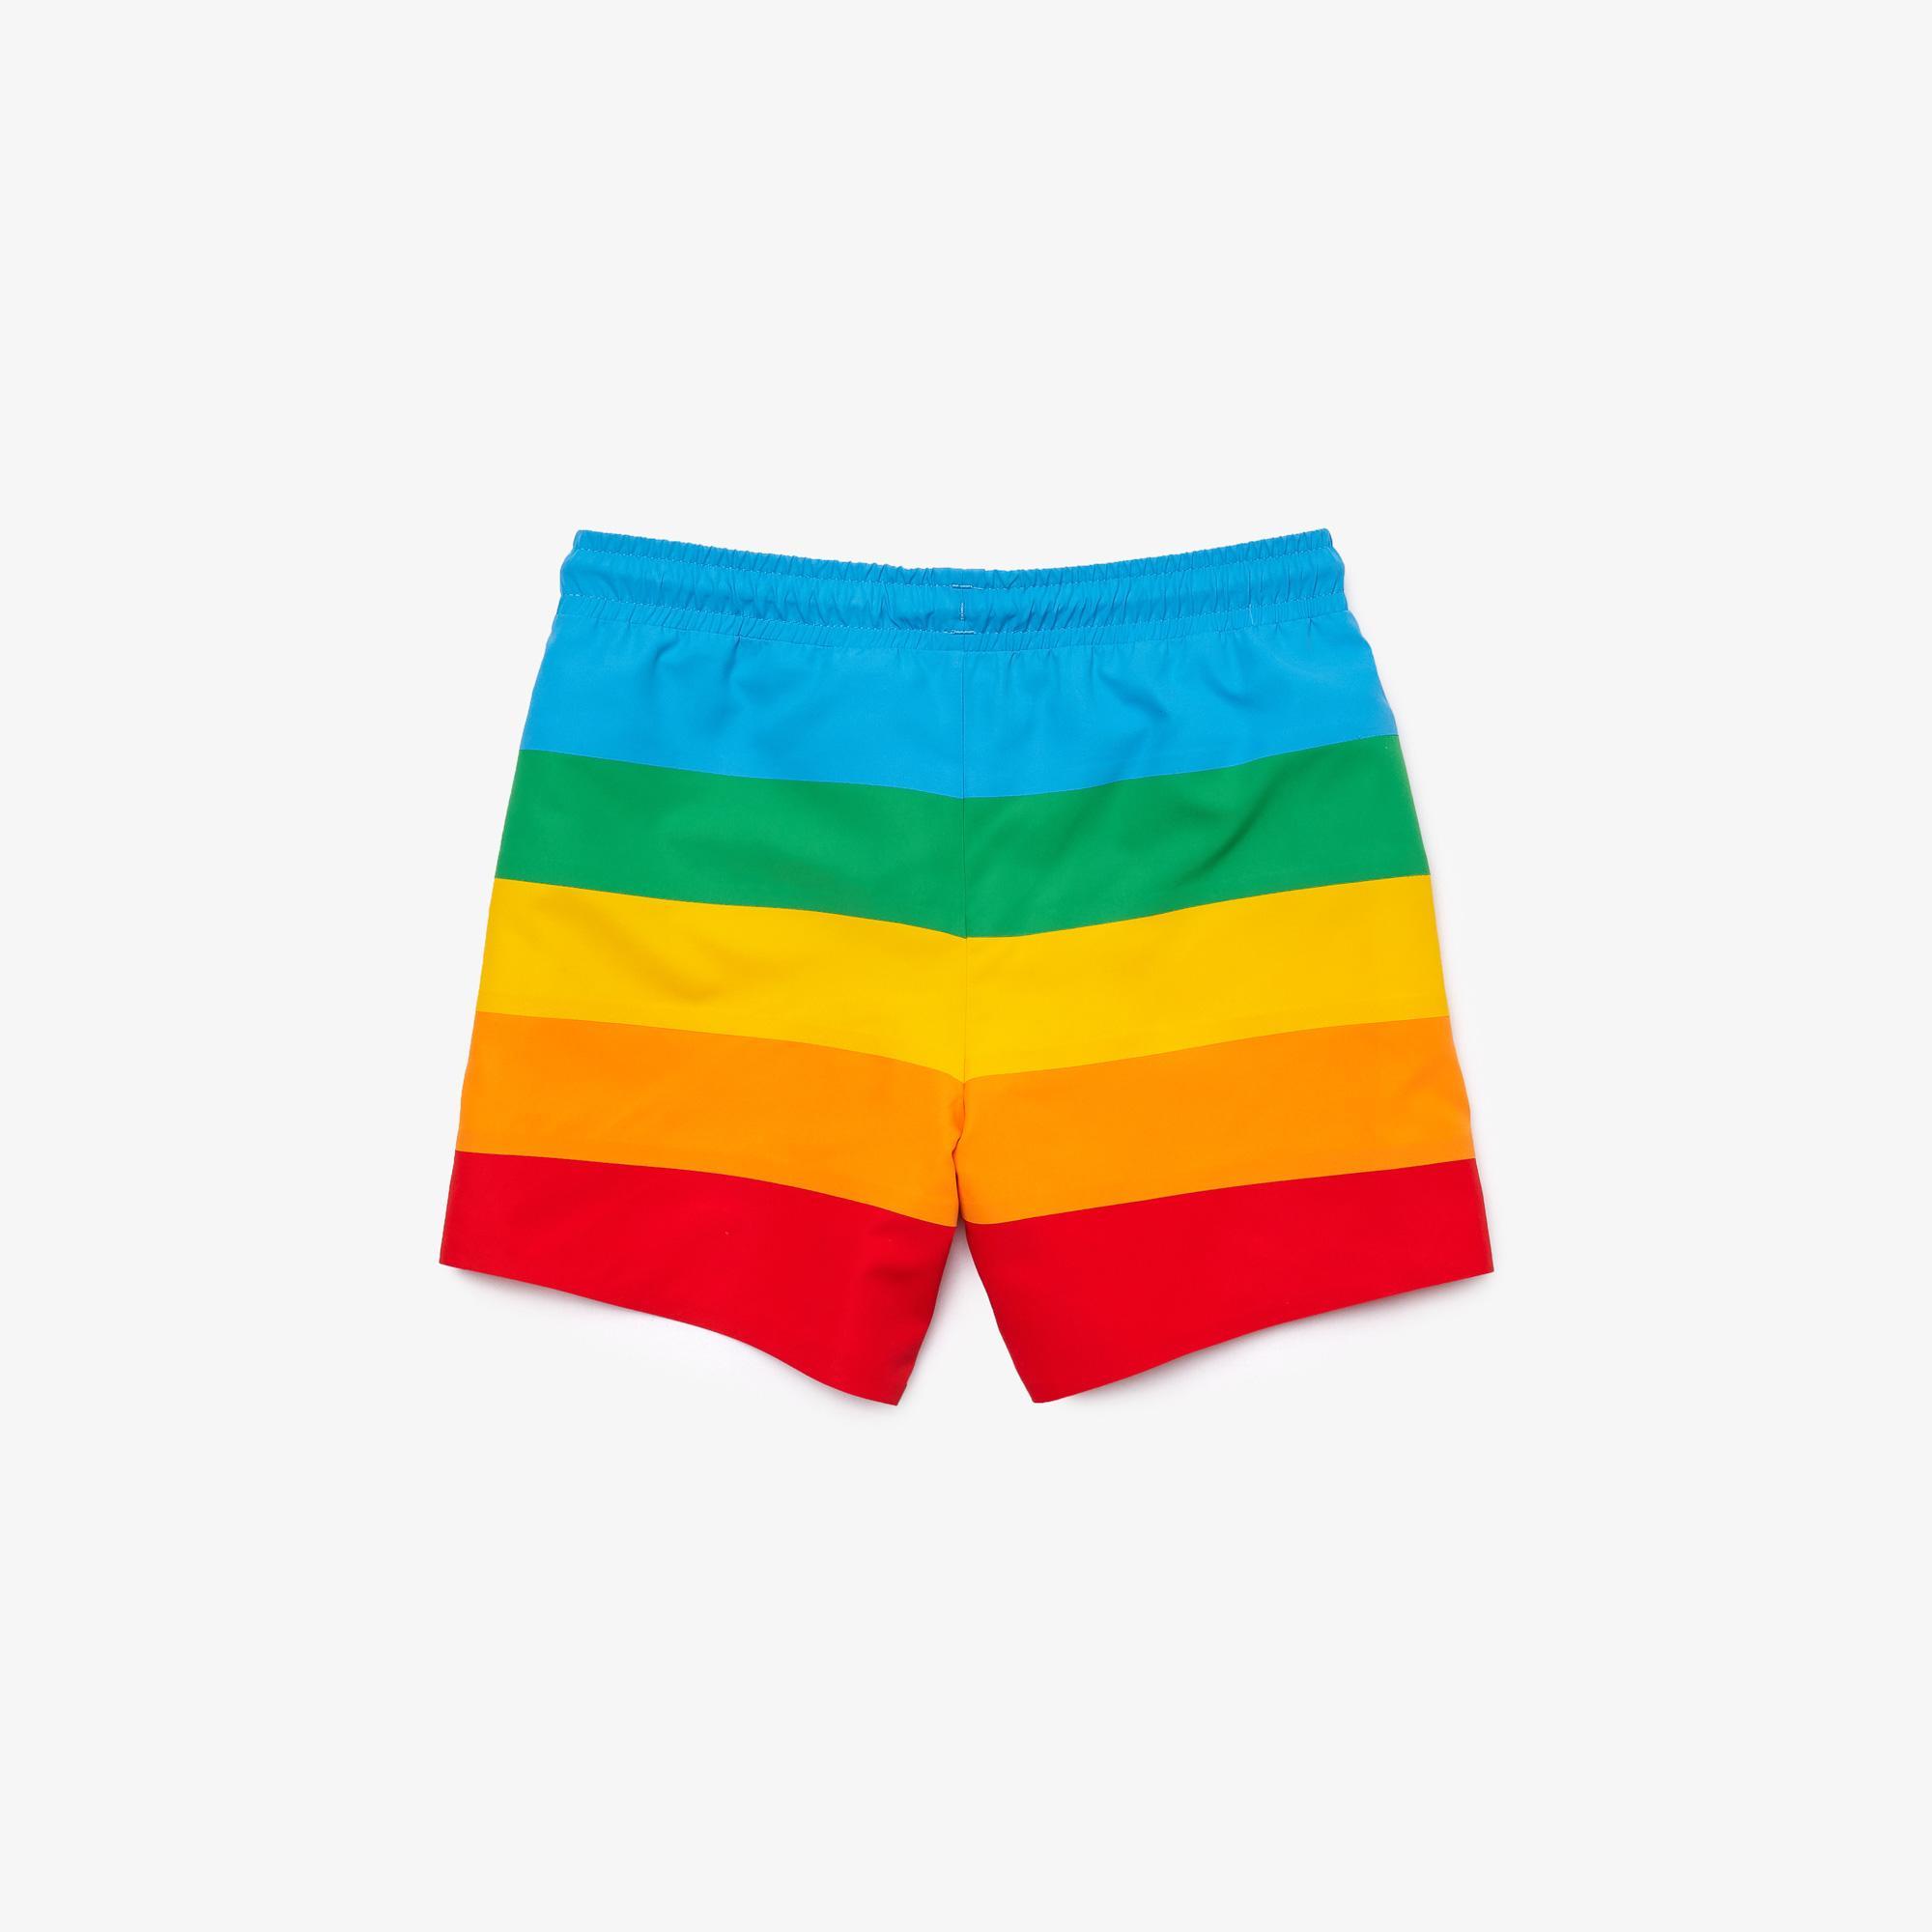 Lacoste Boys' Swimsuit